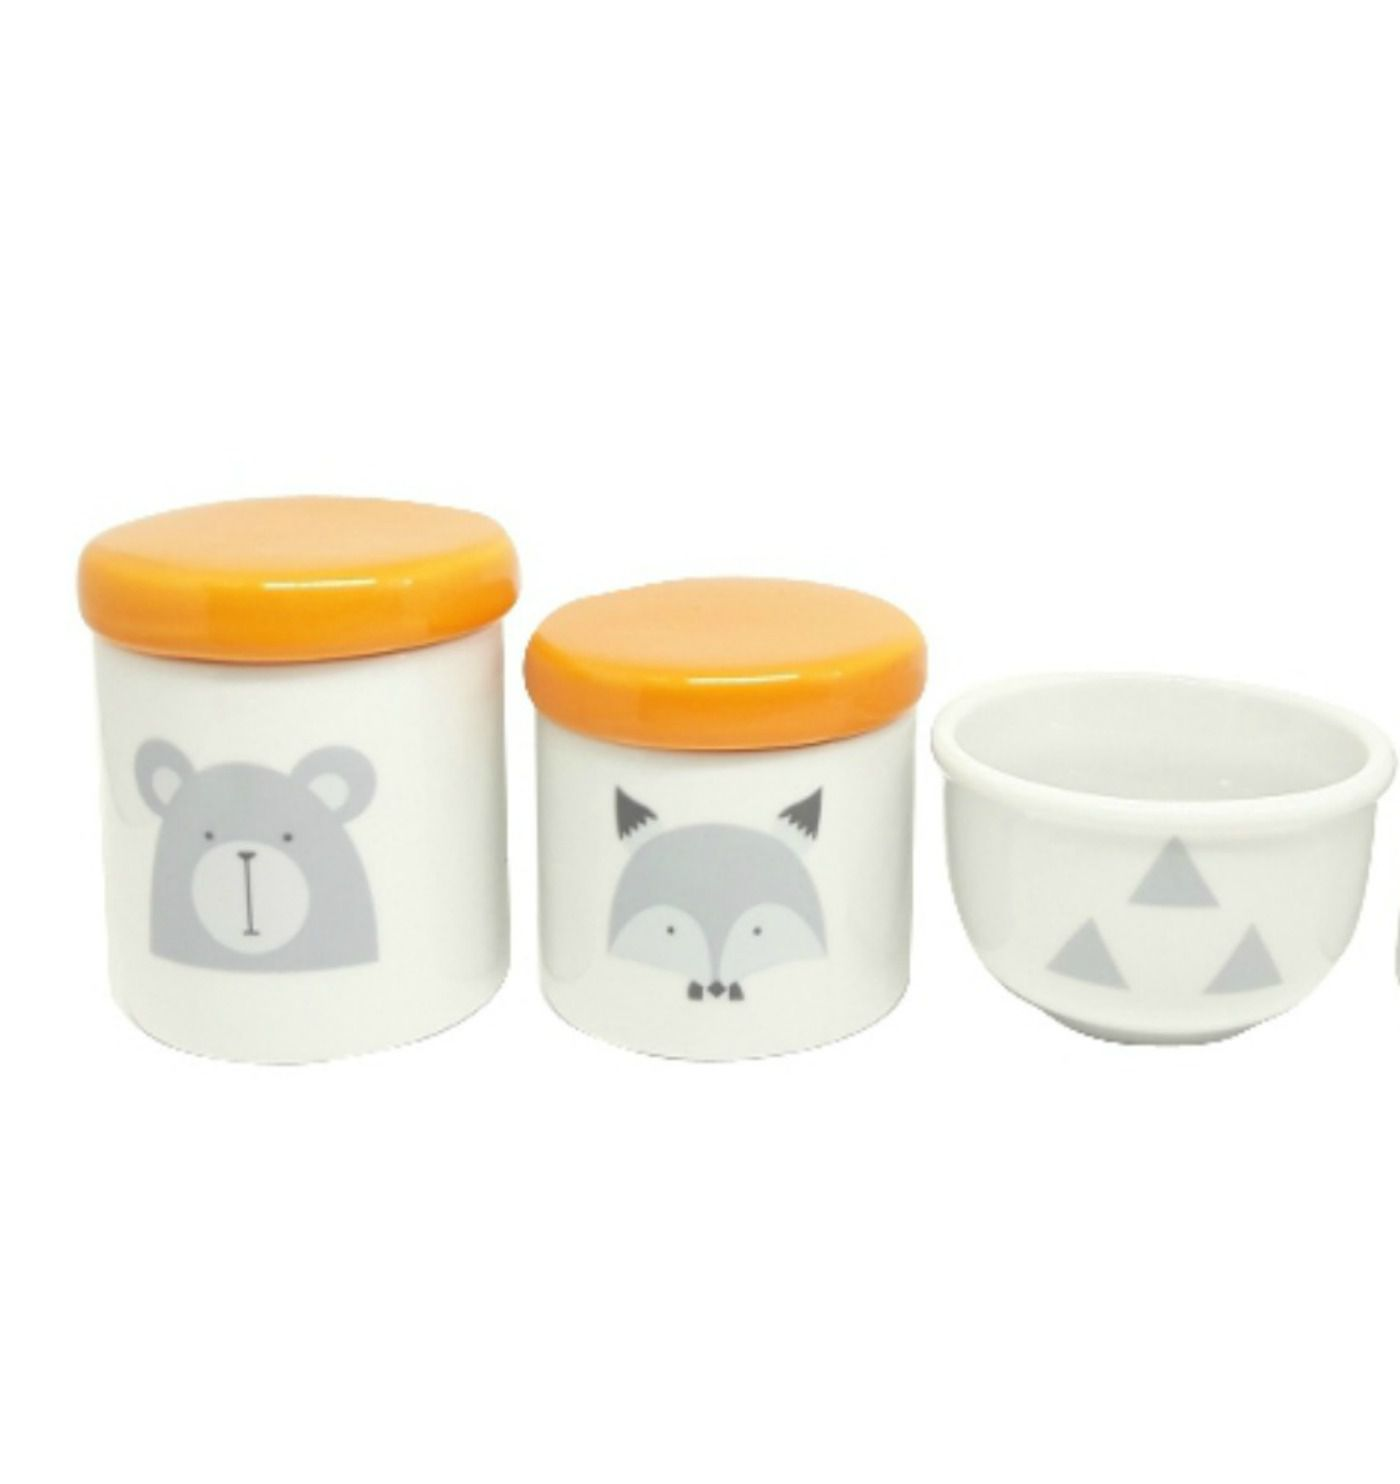 Kit Higiene Bebê Porcelana Escandinavo |Urso e Raposa | Geométrico | Tampas Laranjas